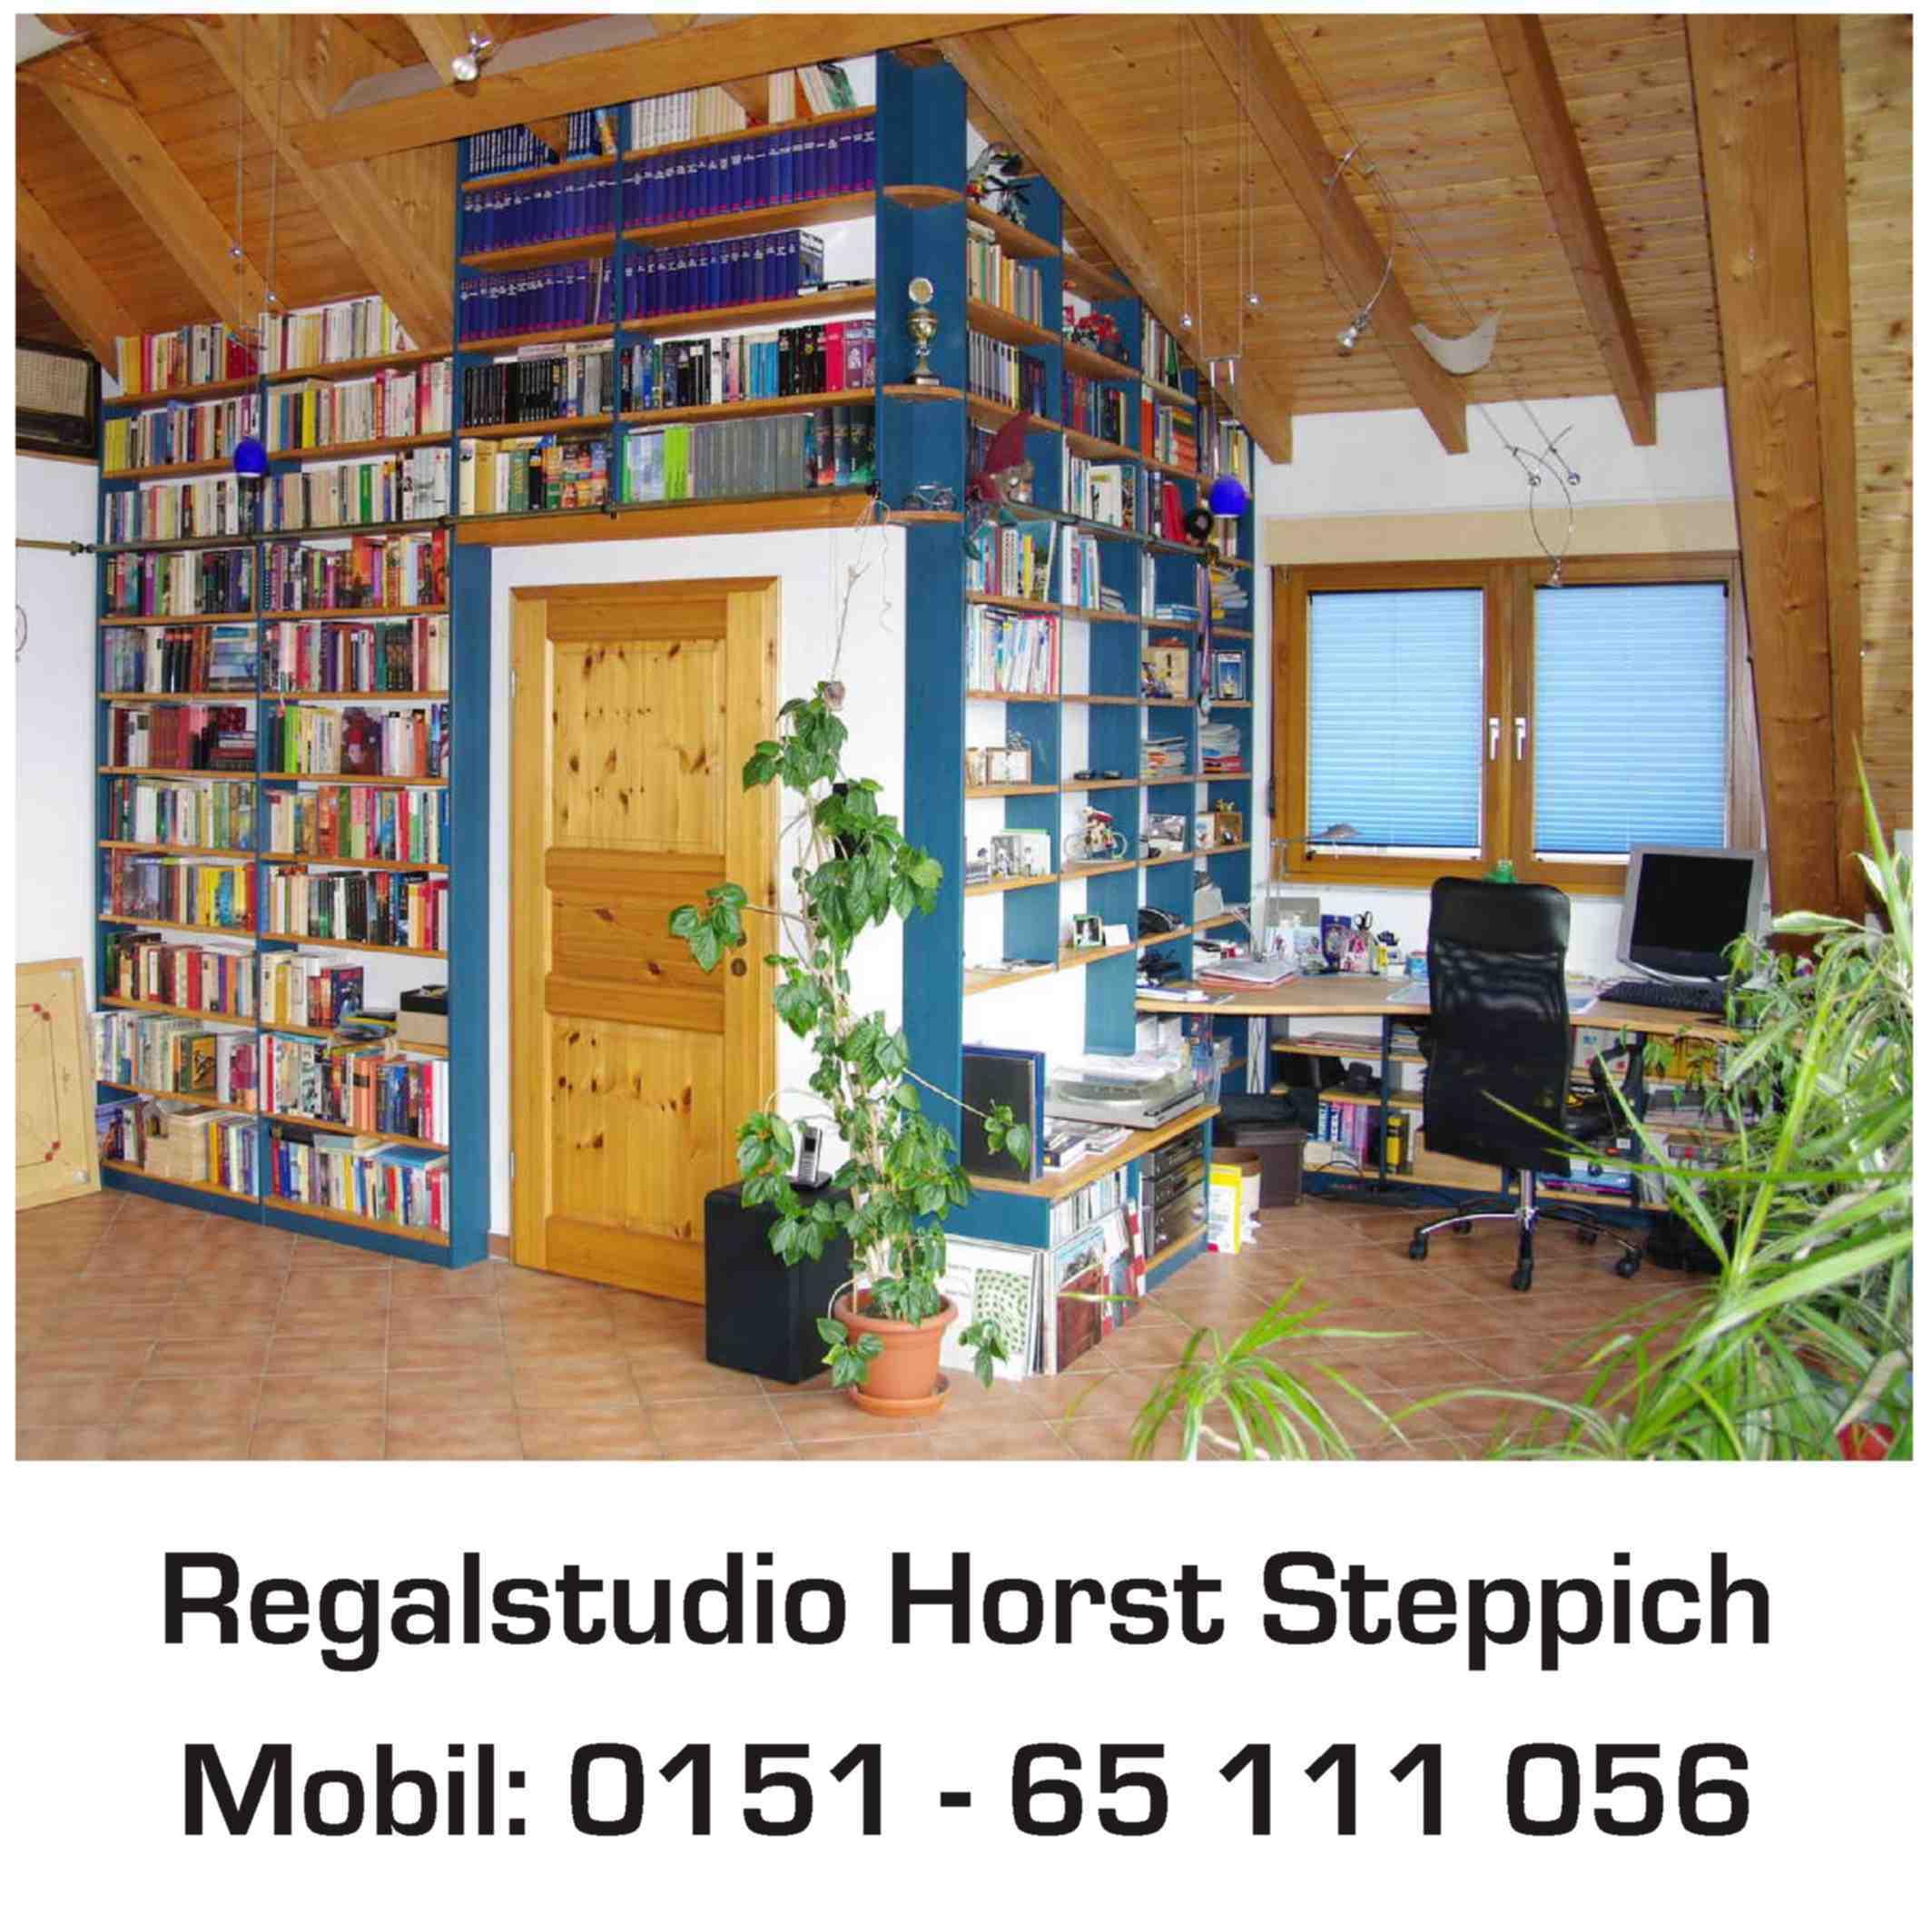 Regalstudio Horst Steppich - Mobil: 0151 - 65 111 056